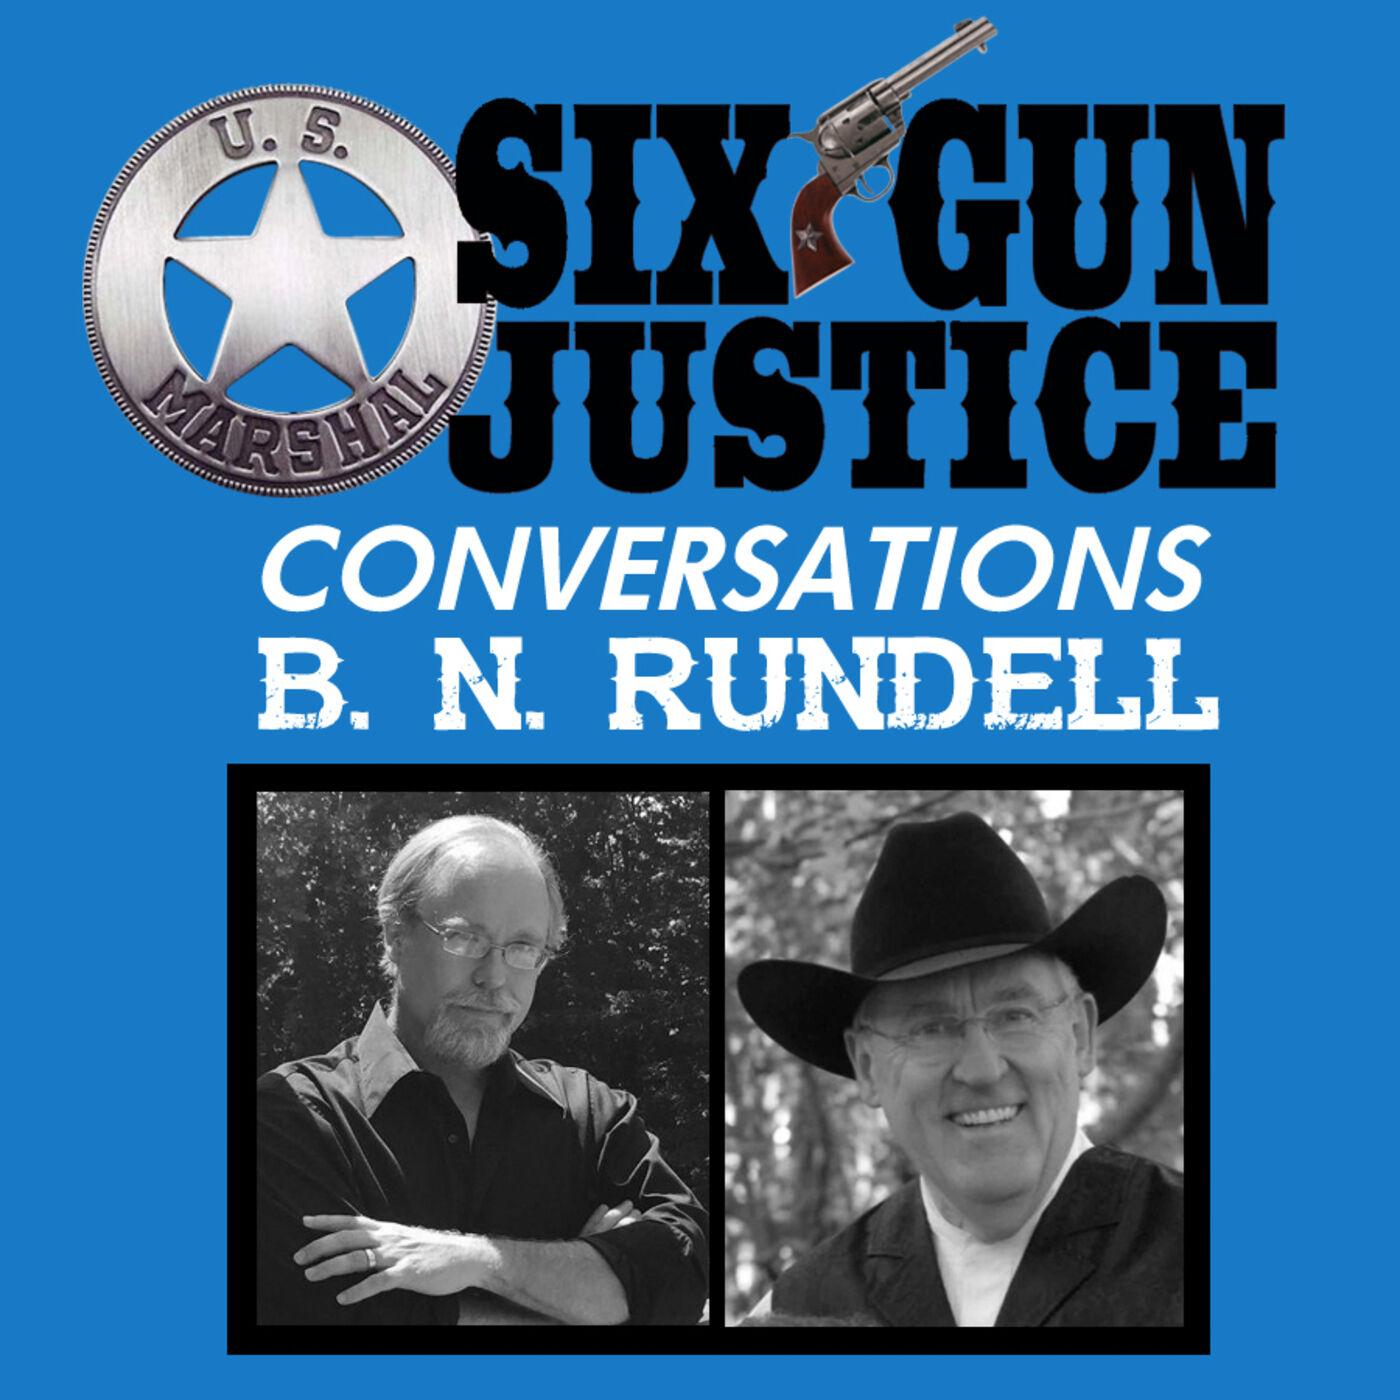 SIX-GUN JUSTICE CONVERSATIONS—B.N. RUNDELL